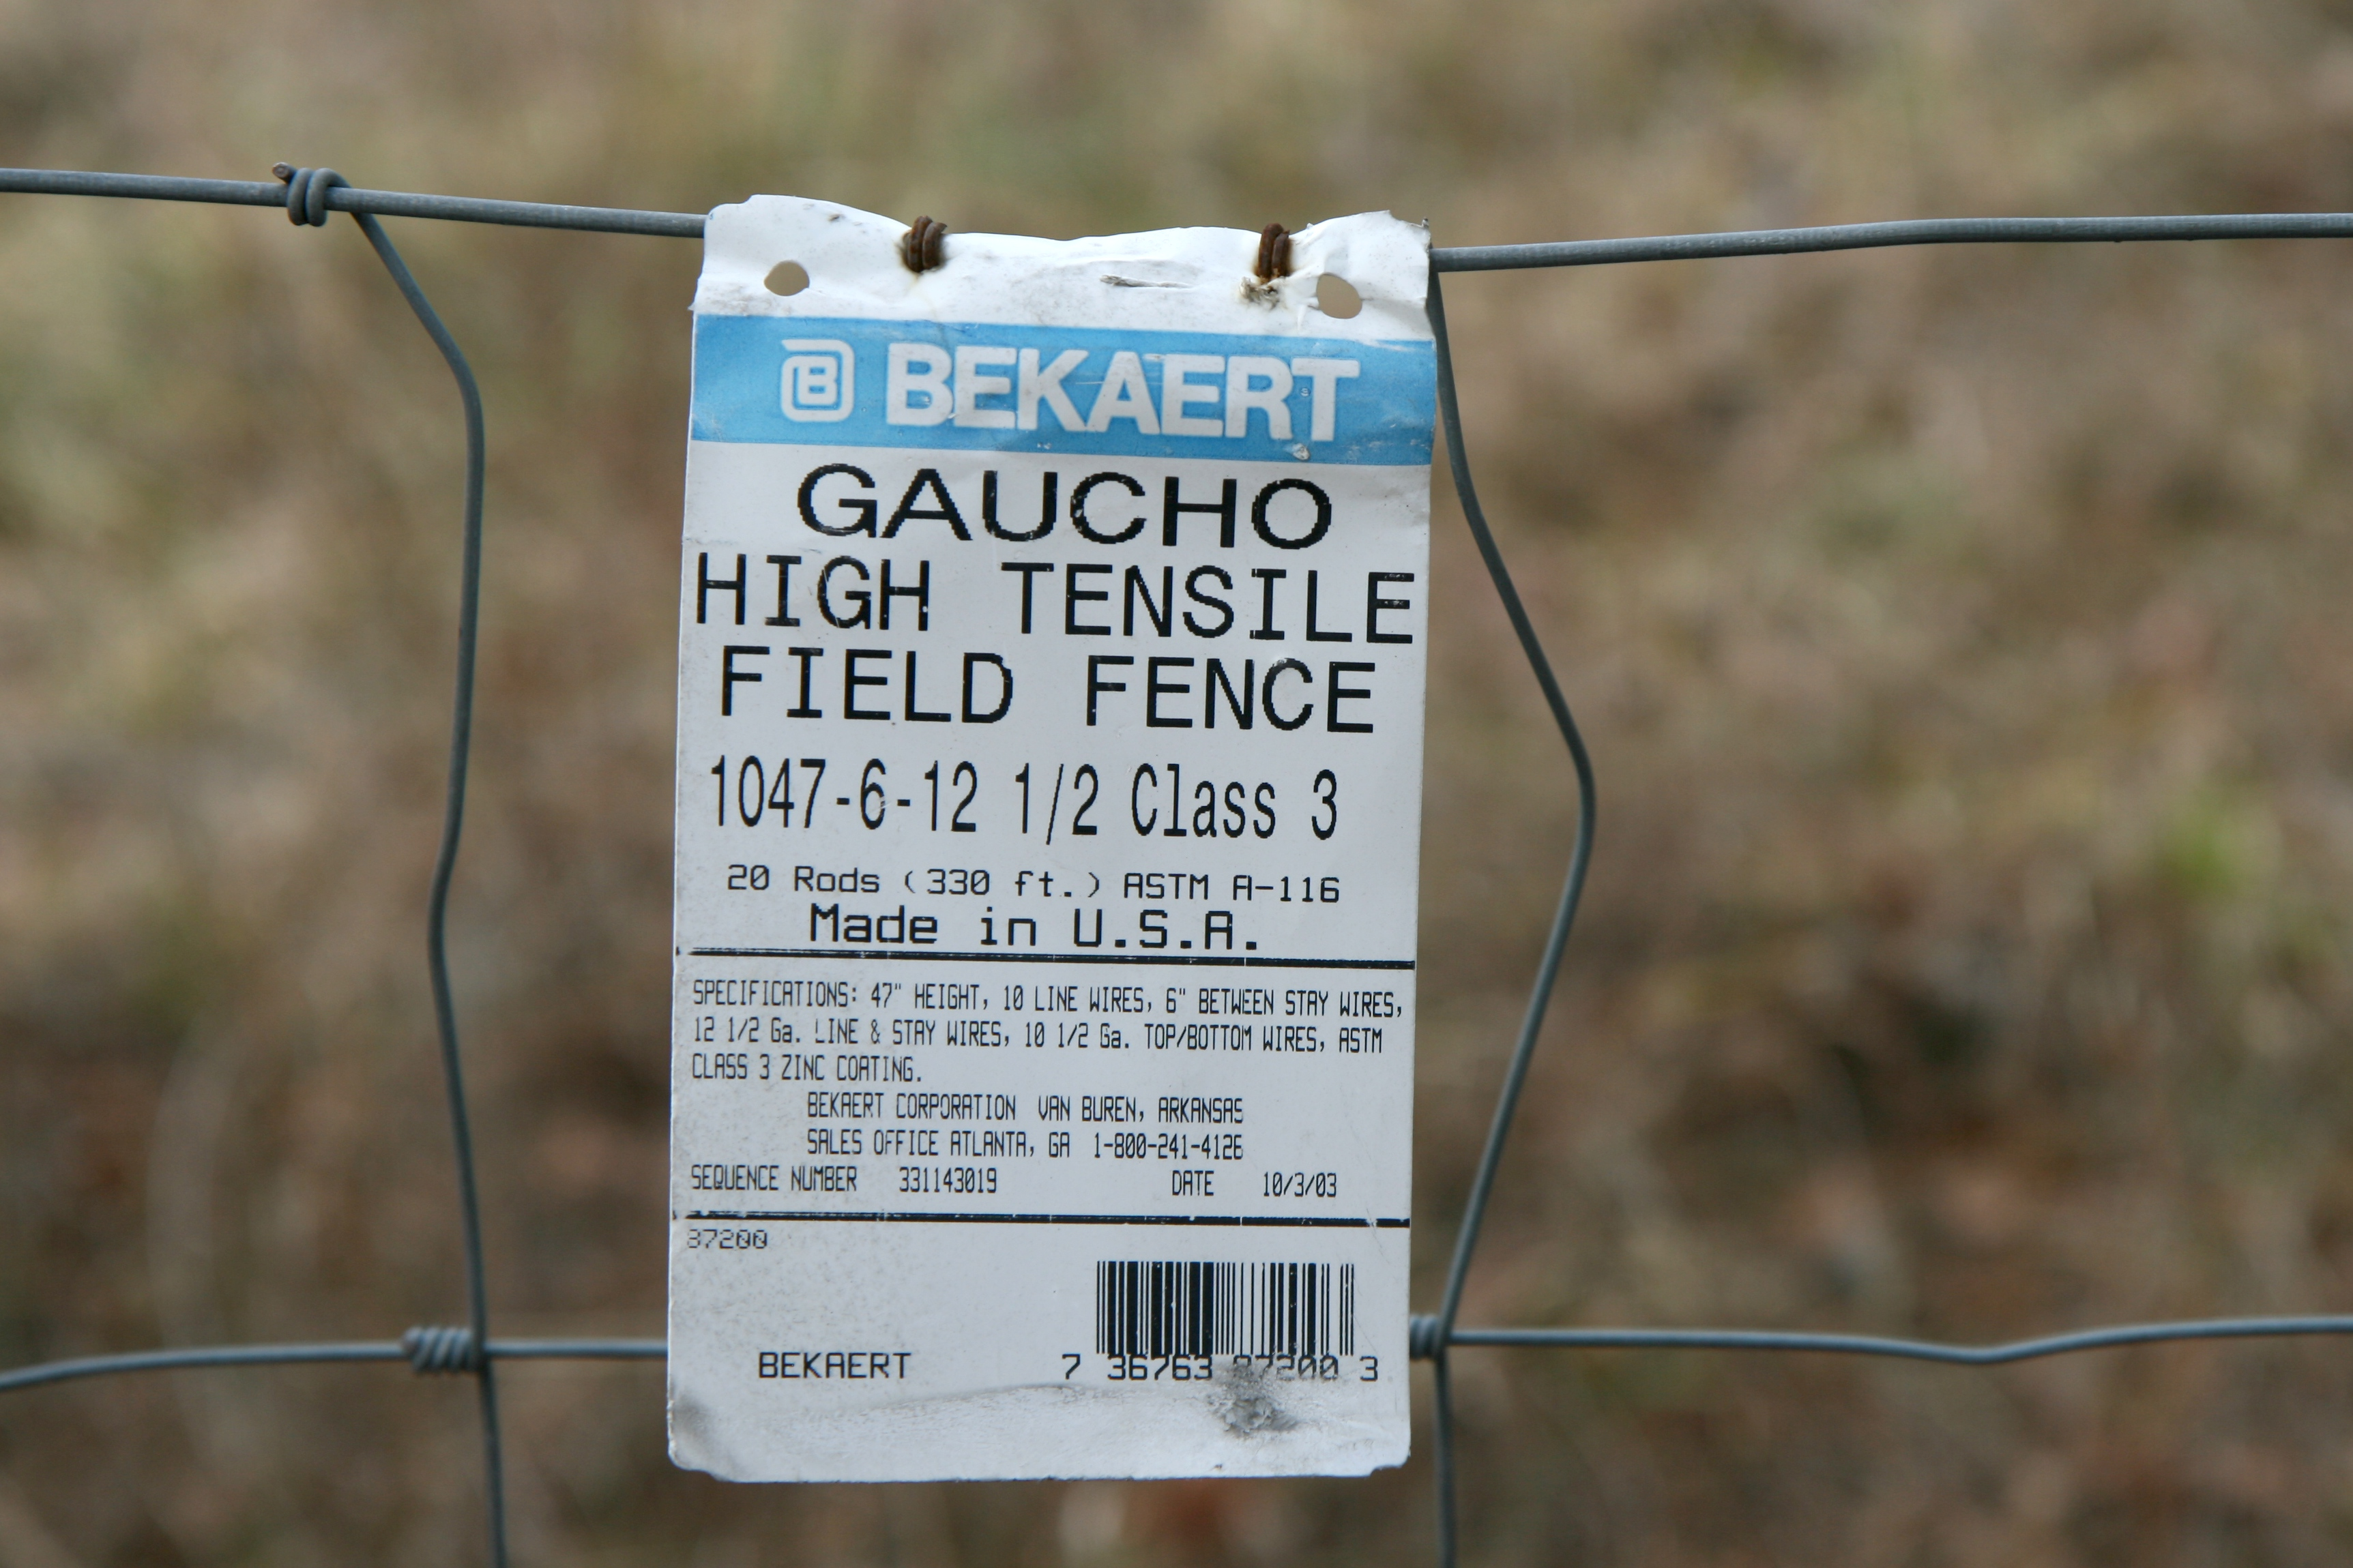 File:2011-02-02 Bekaert Gaucho fence tag.jpg - Wikimedia Commons